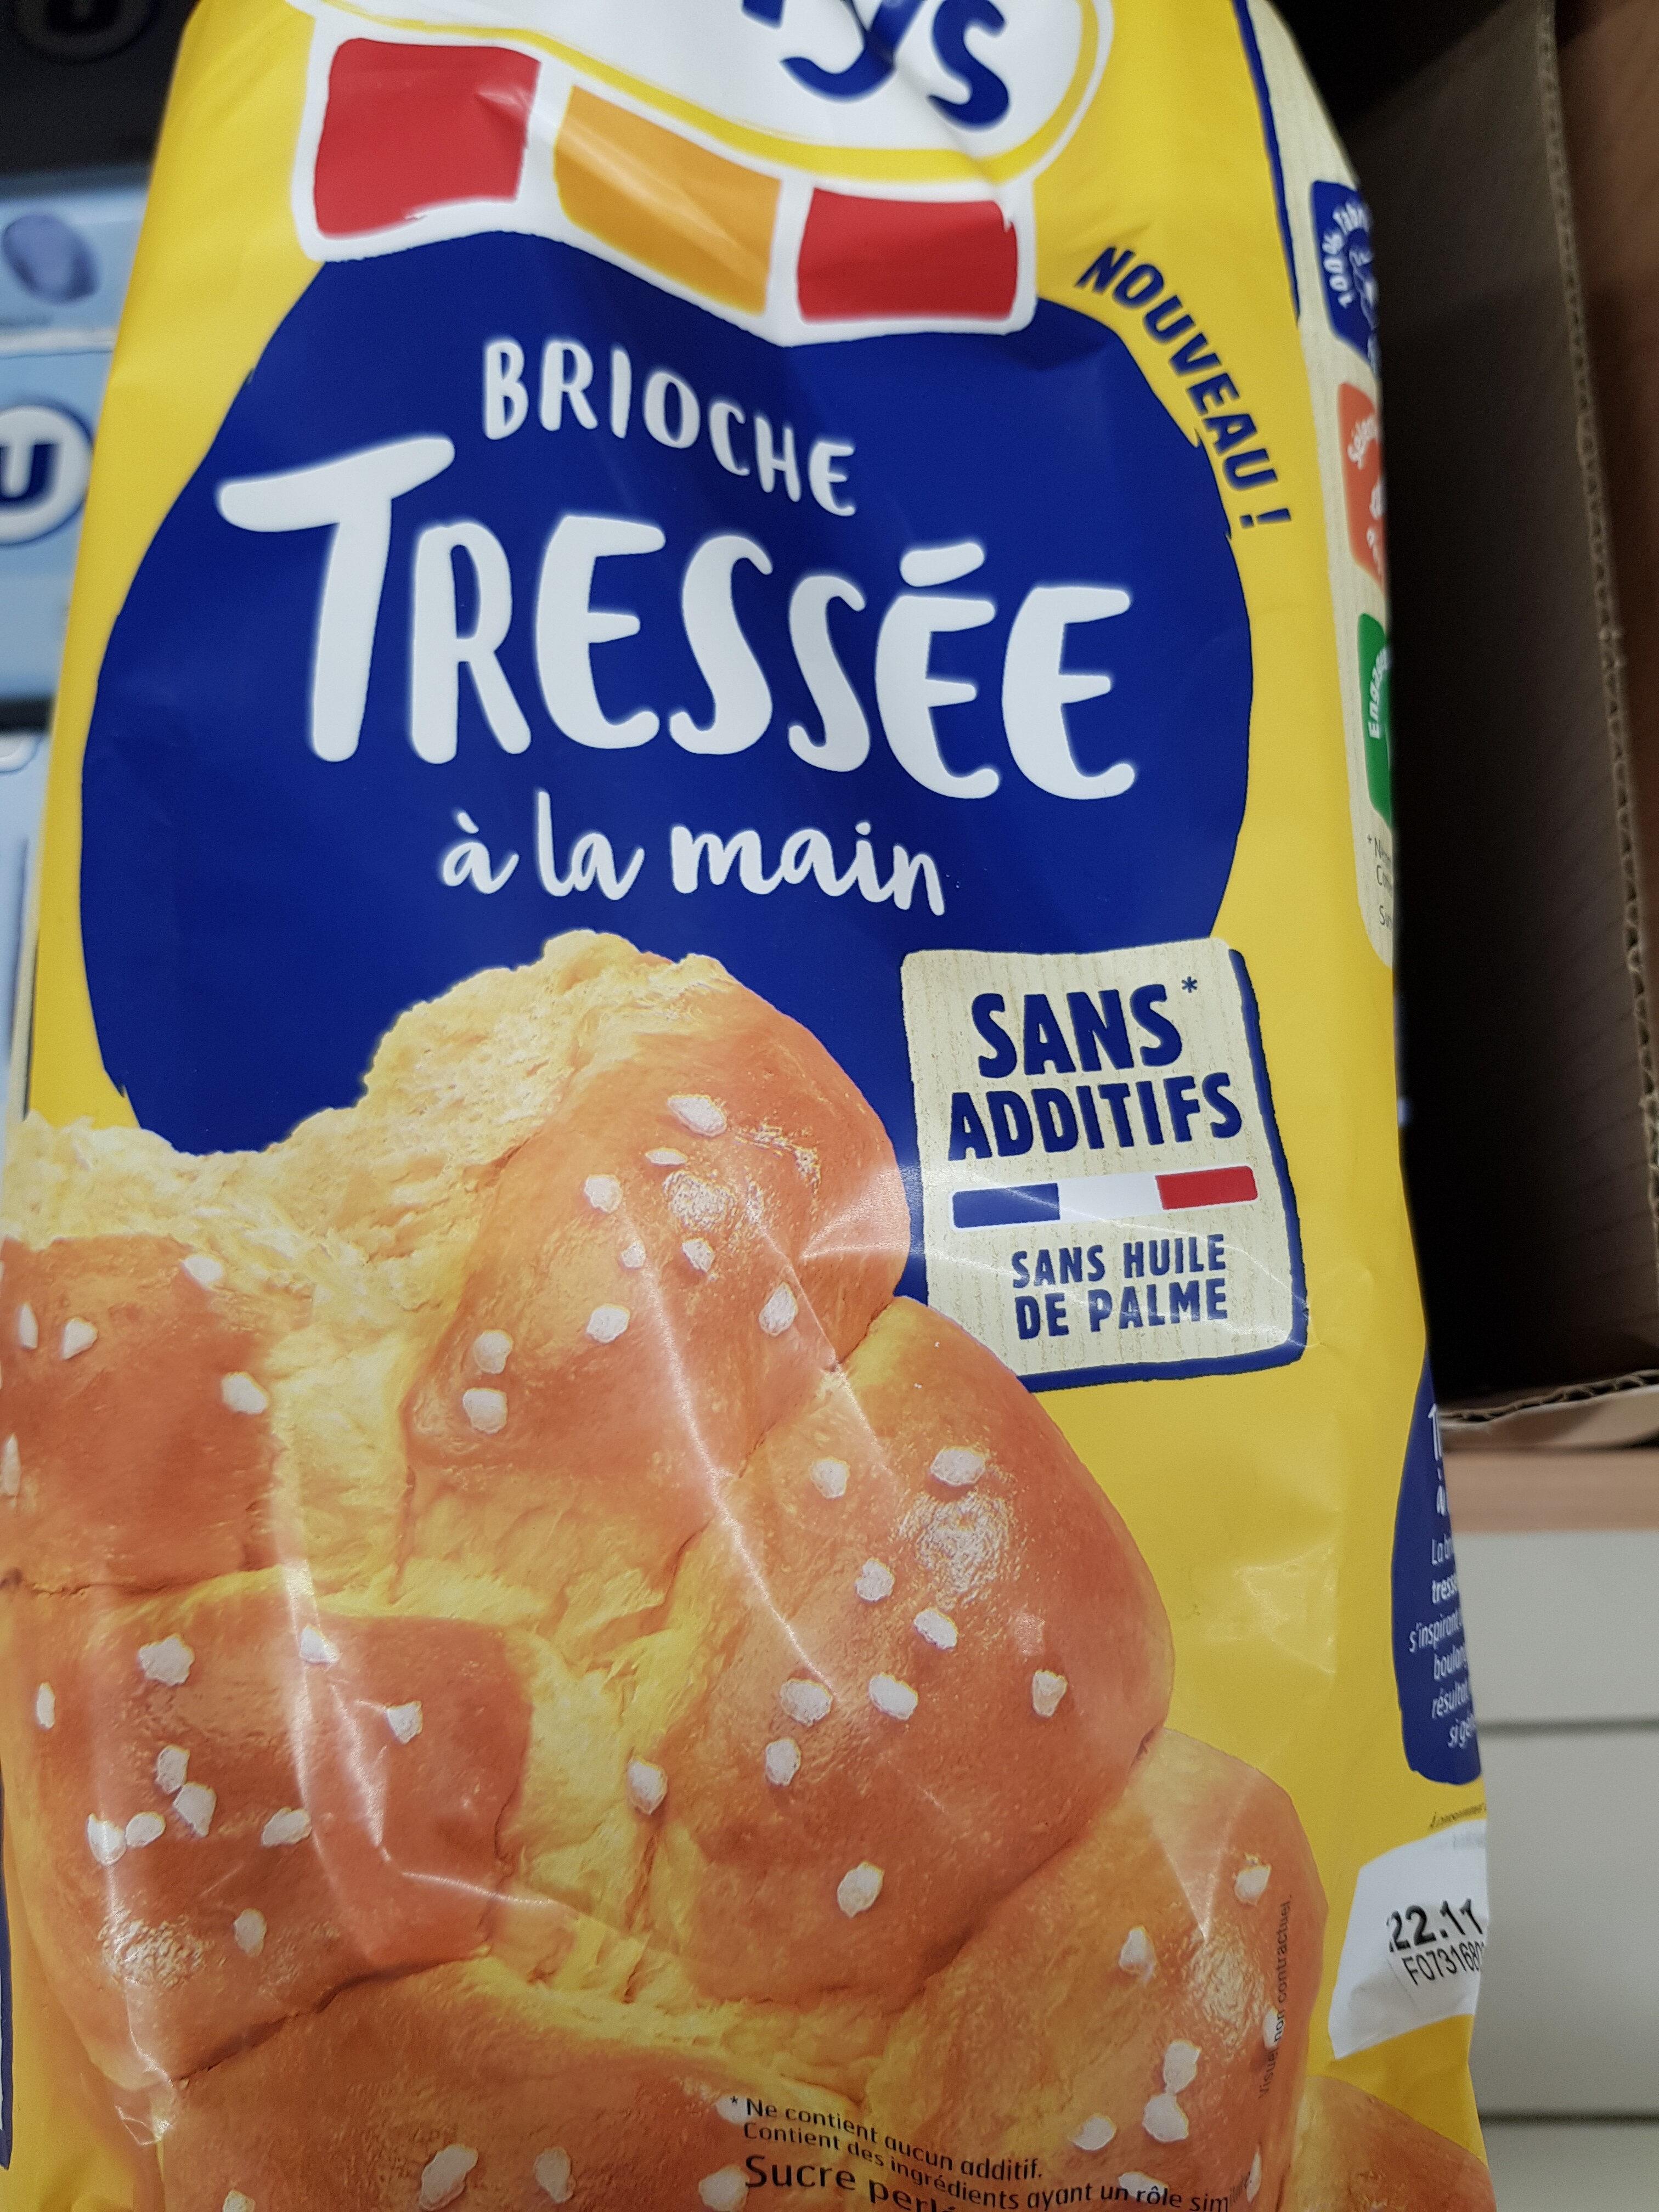 Brioche tressée nature ss additifs - Produit - fr